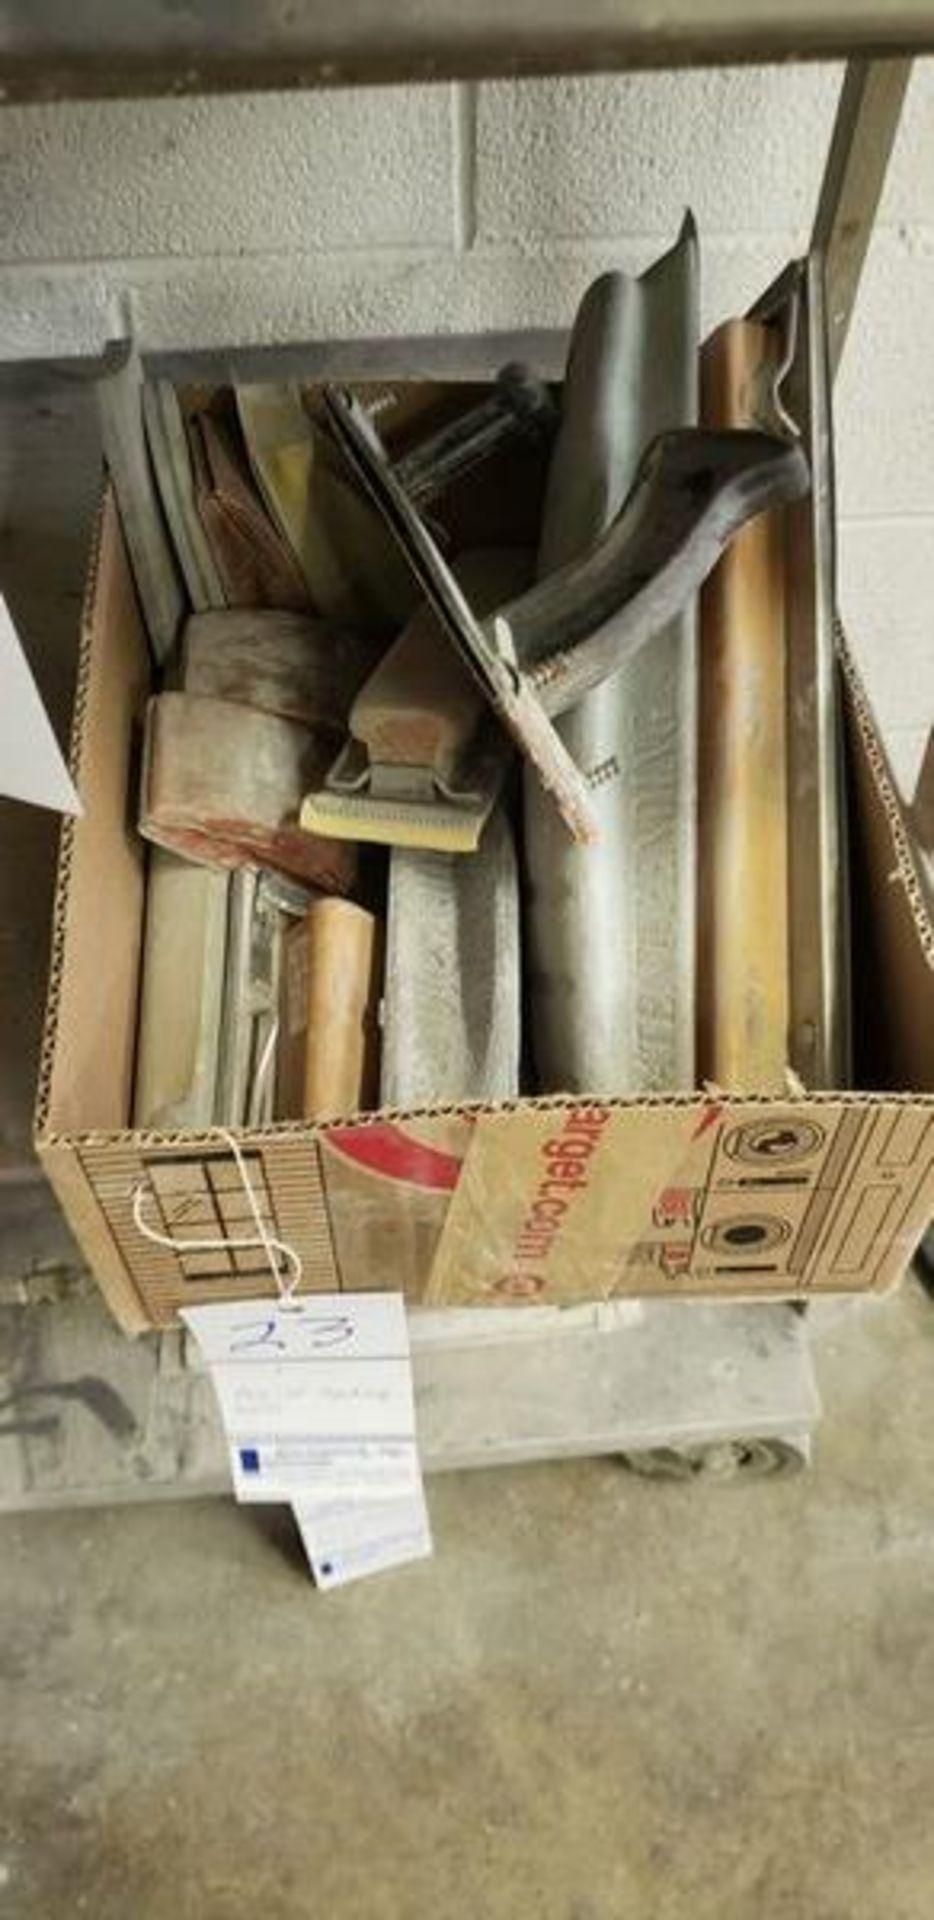 BOX OF SANDING TOOLS